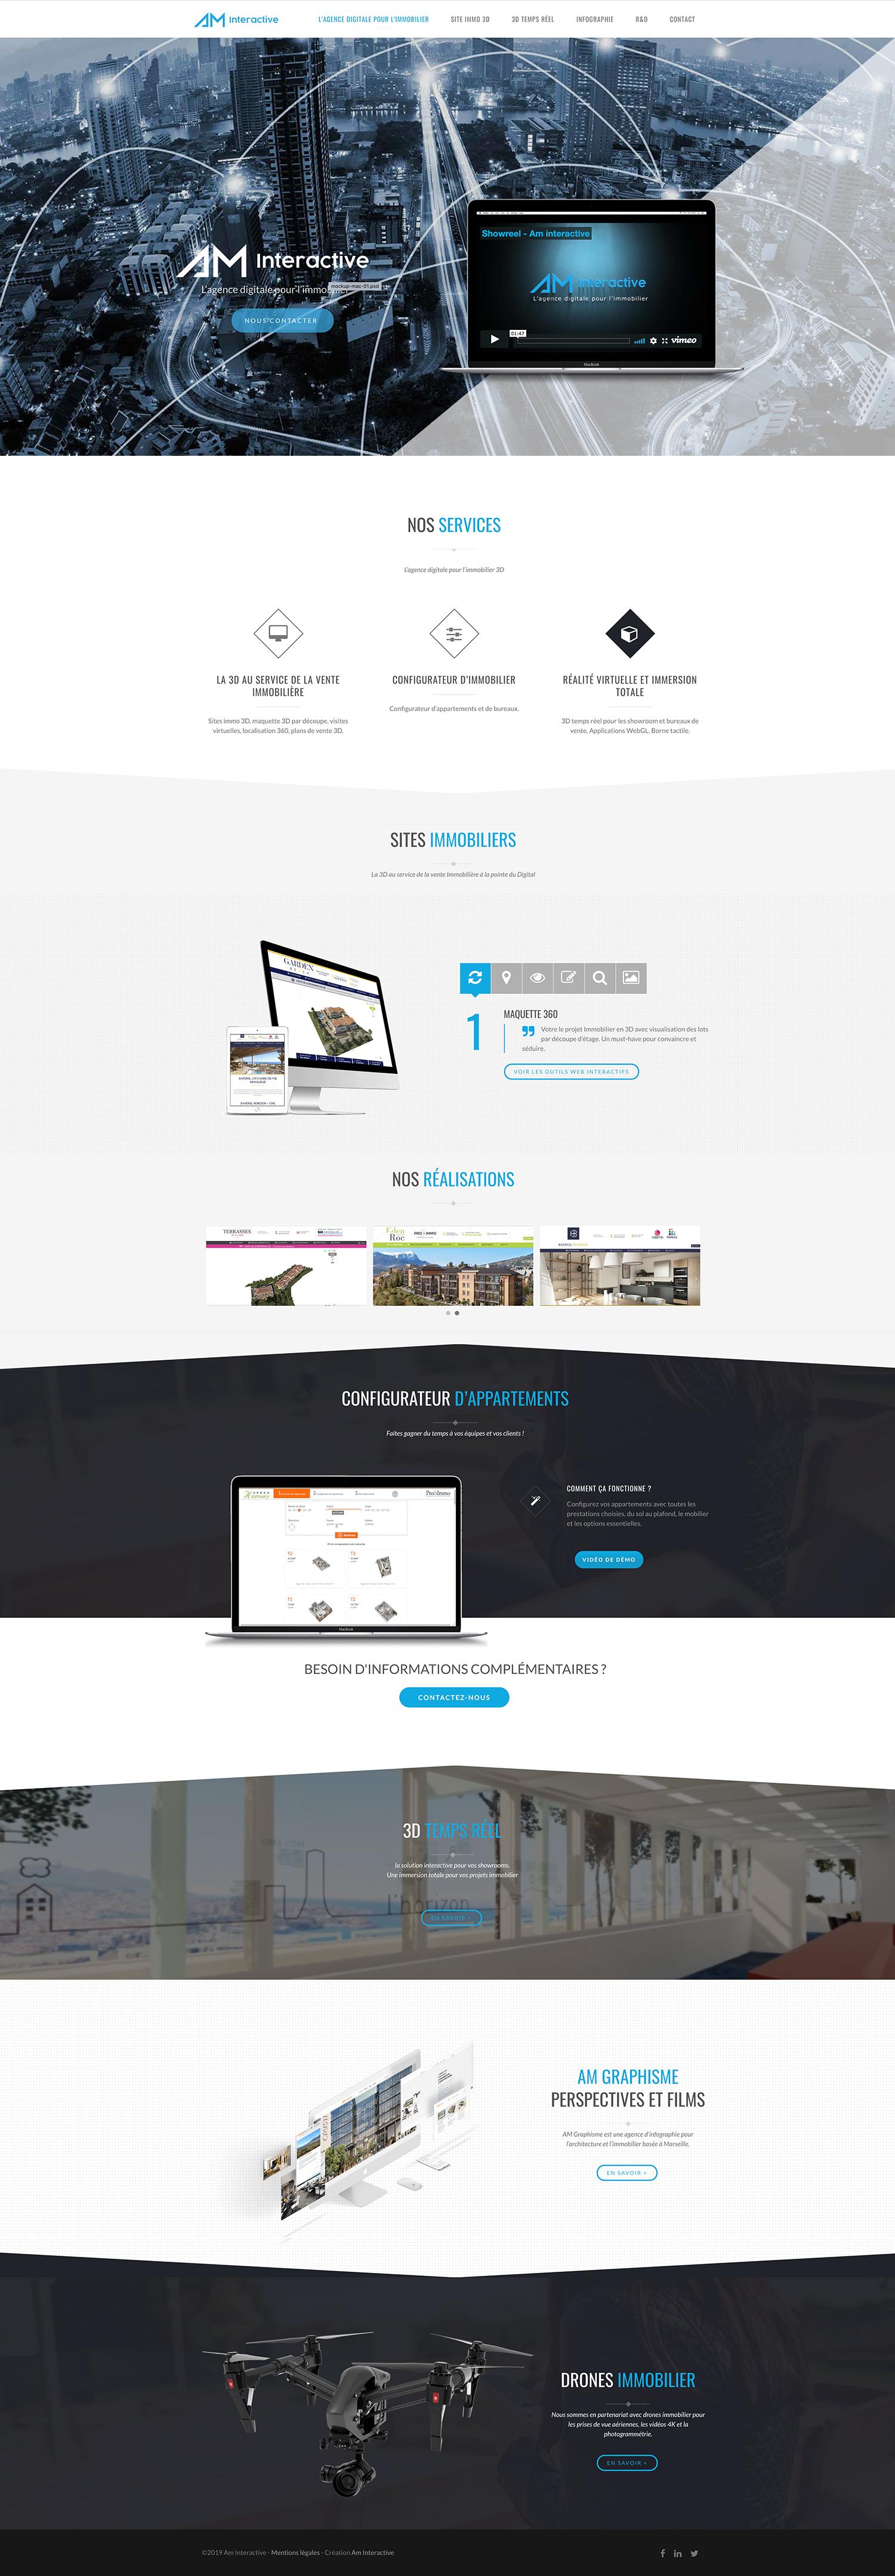 Webdesign Am intéractive Marseille